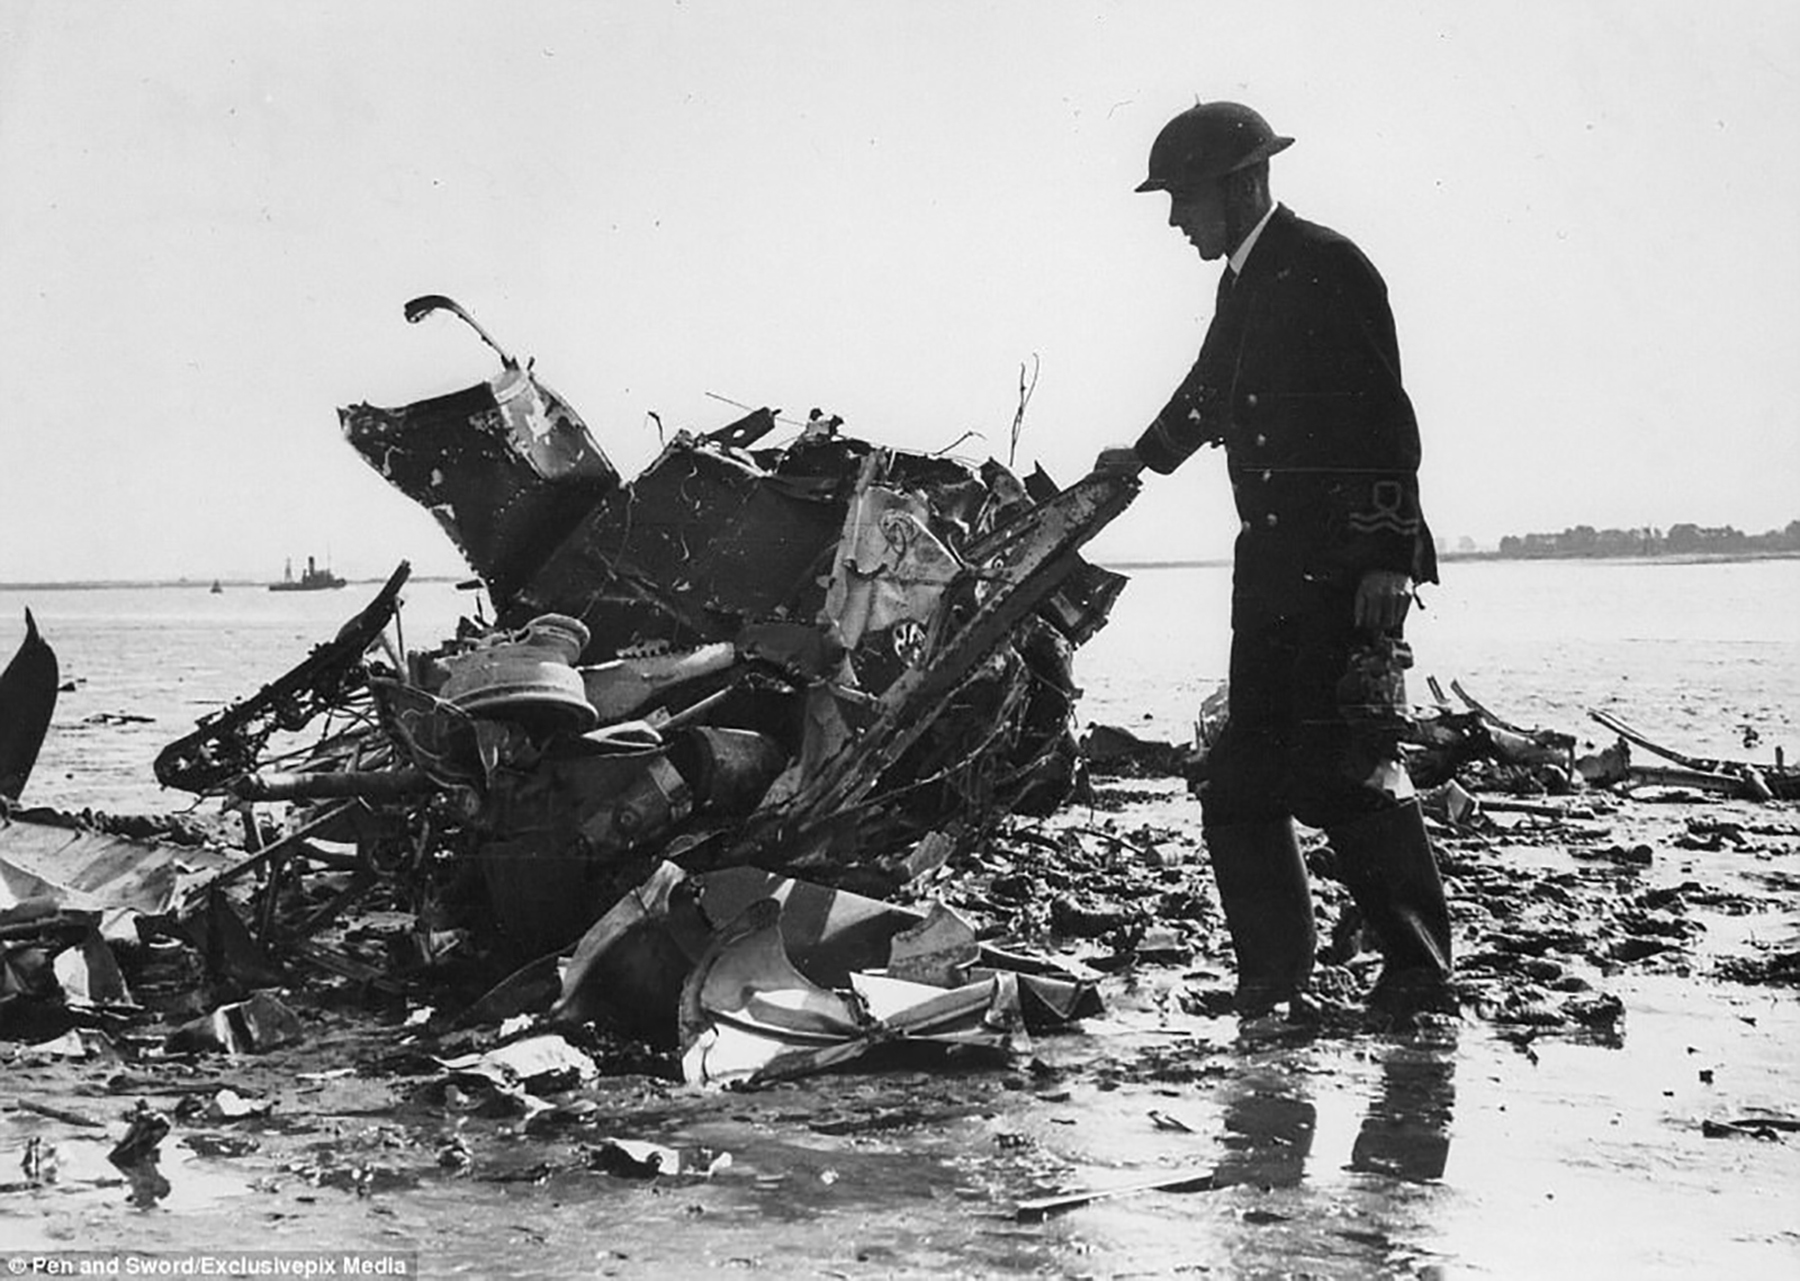 Spitfire MkI RAF 66Sqn PJC King KIA parachute failed to open sd off Hoo Marina Thames Estuary Kent Sep 1940 01